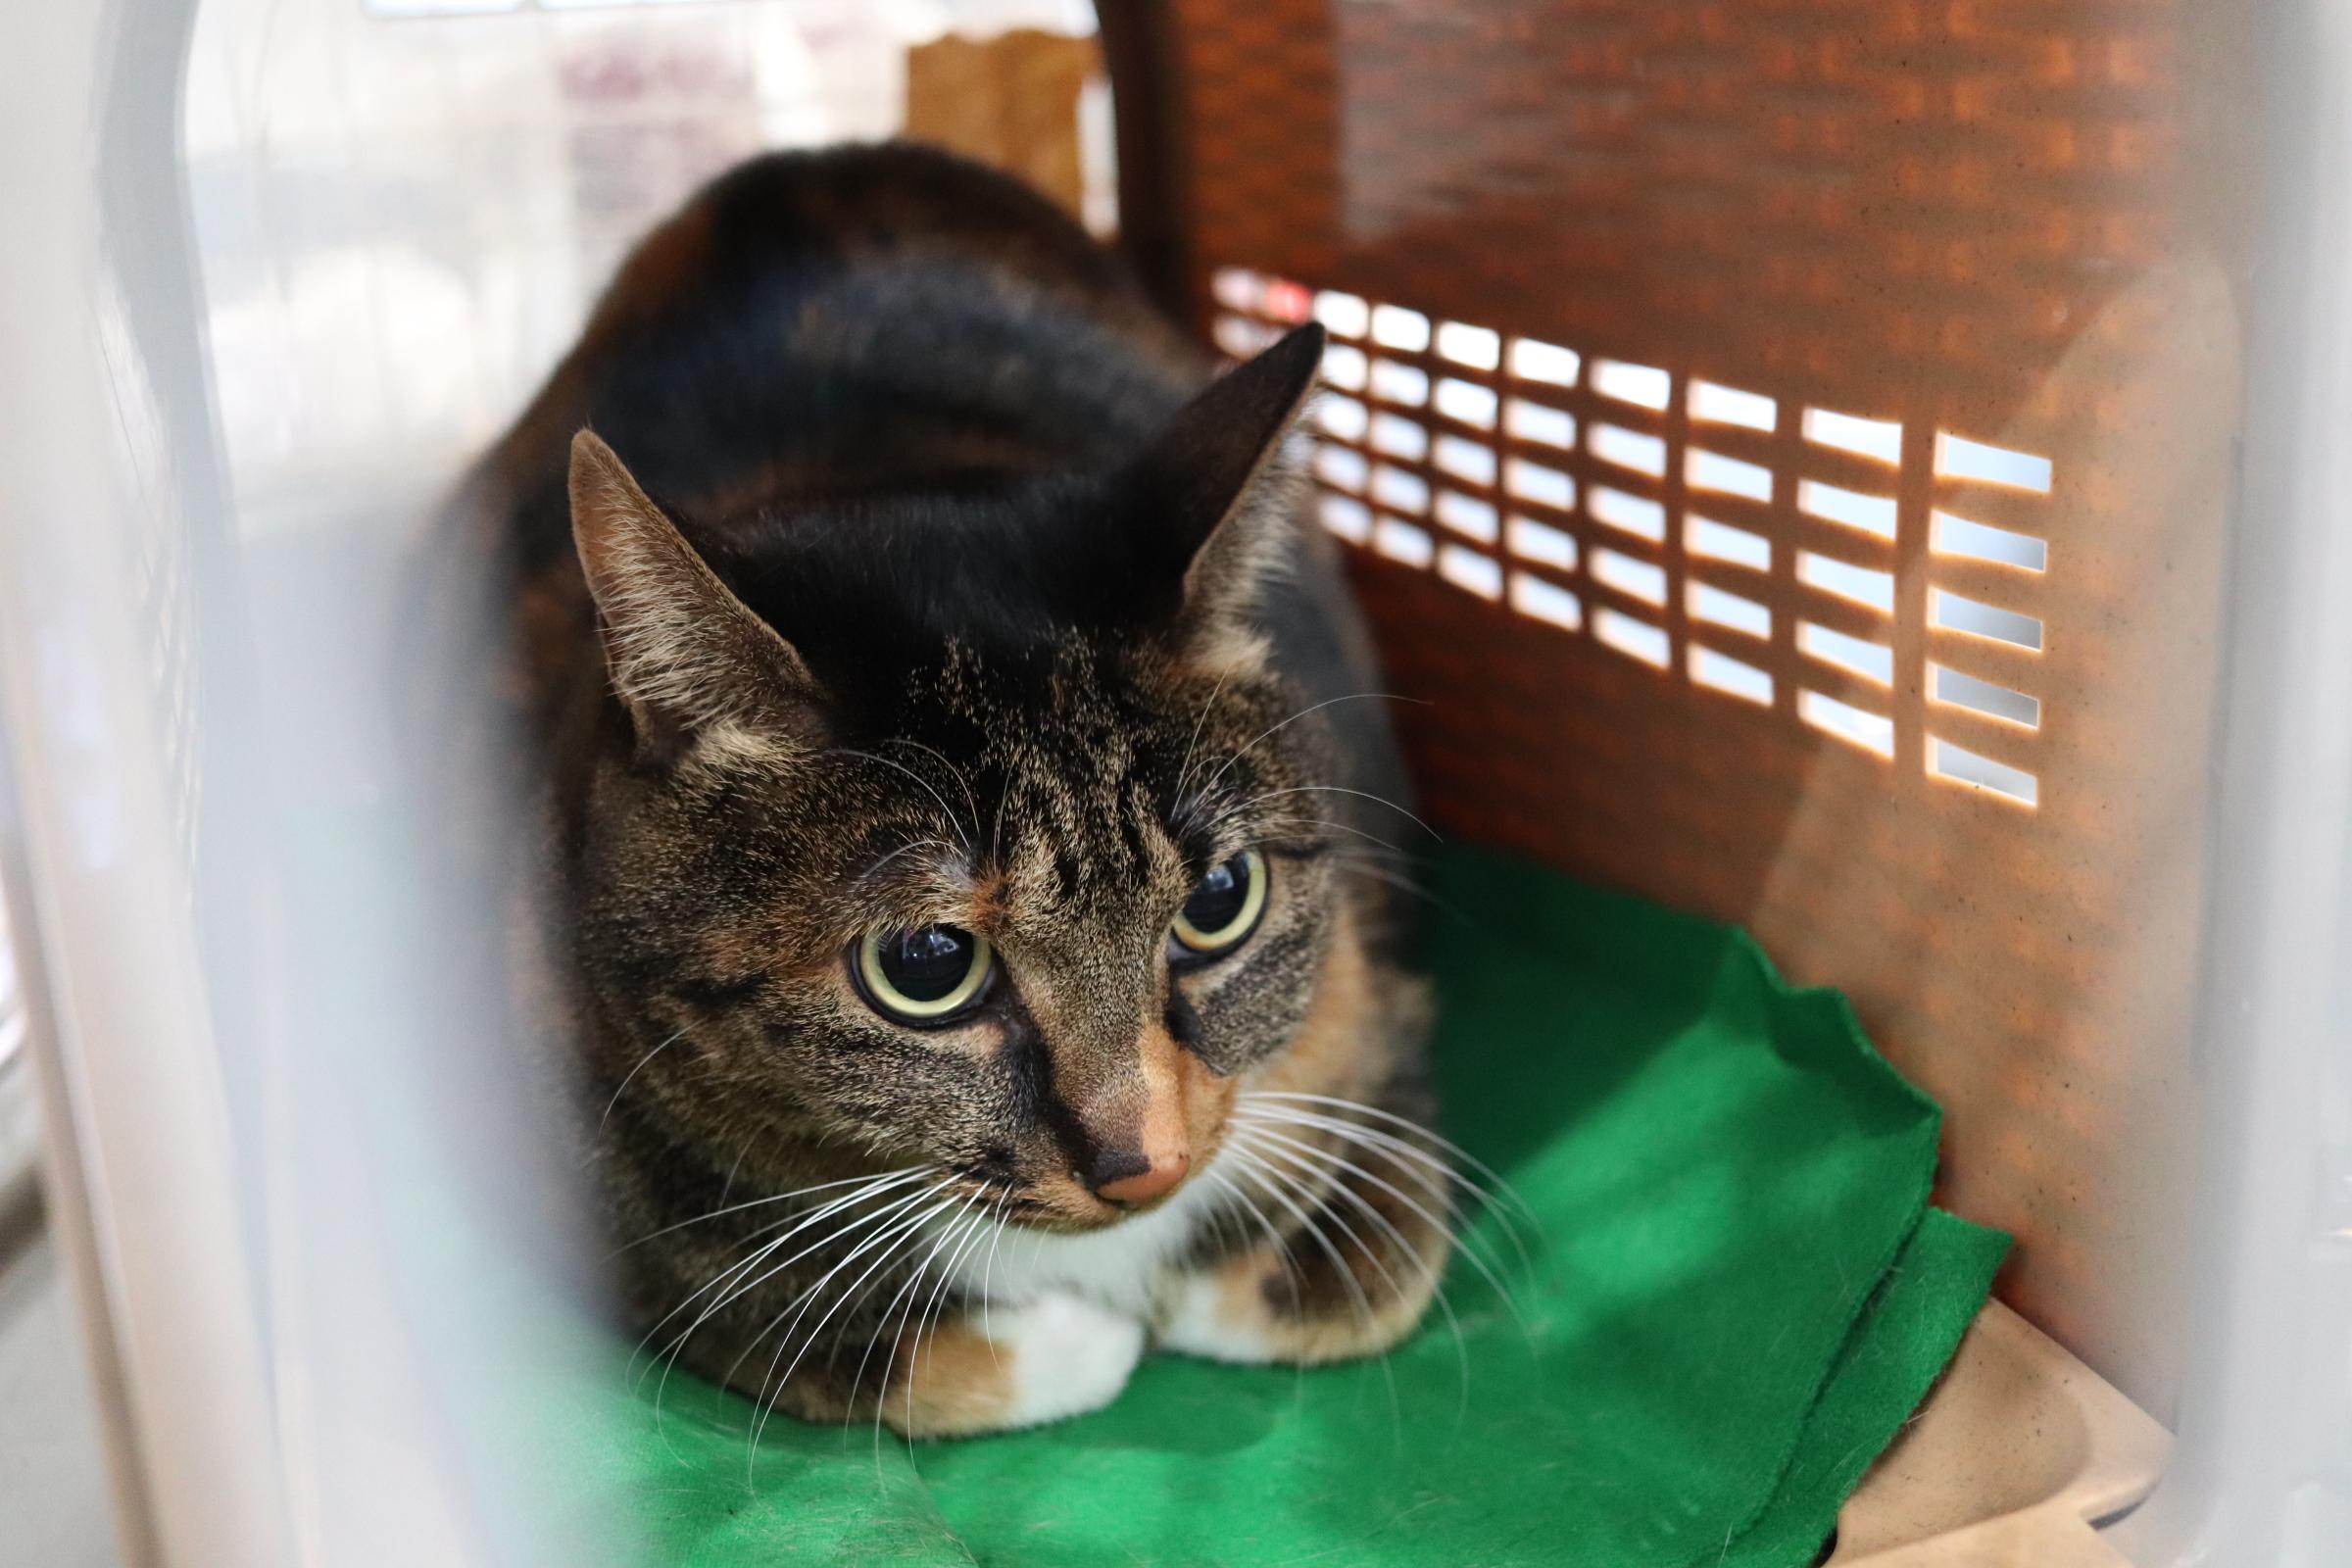 <ul> <li>猫種:日本猫</li> <li>性別:女の子</li> <li>名前:チビ</li> <li>年齢:2016年生まれ</li> <li>保護経緯:飼い主が高齢になり入院したため飼育困難 </li> </ul>